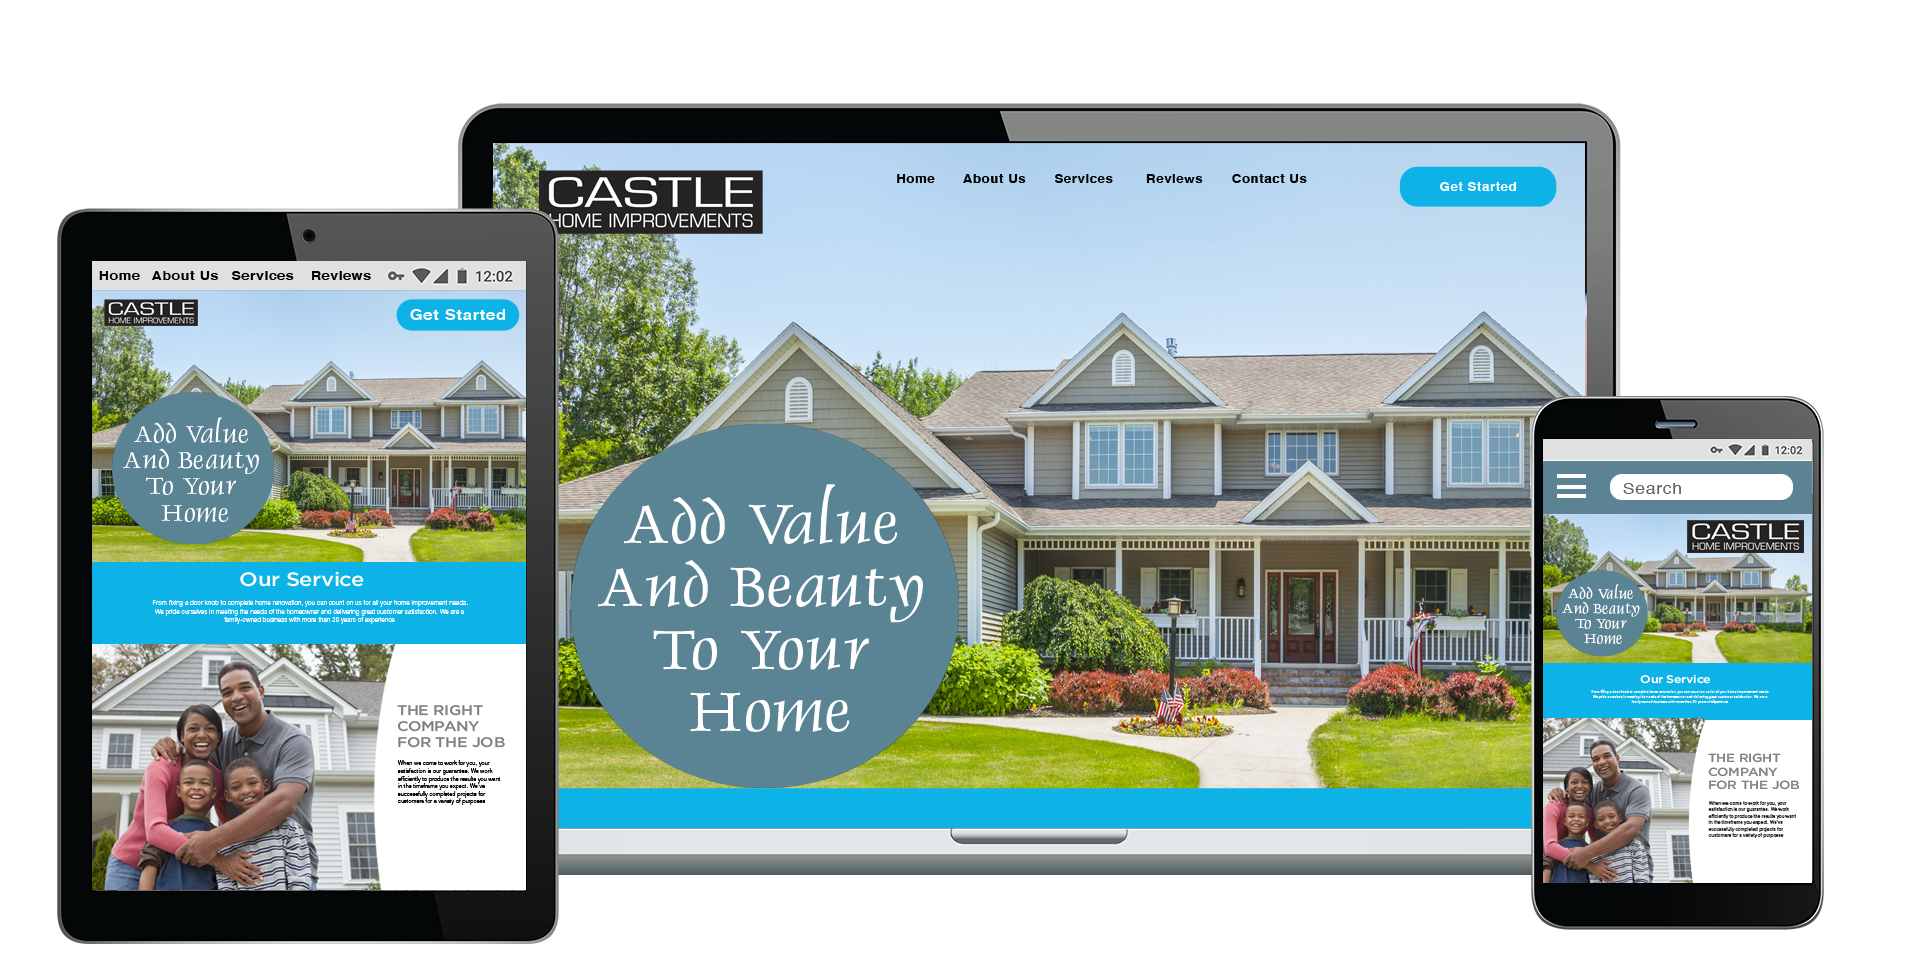 New Hampshire digital marketing services